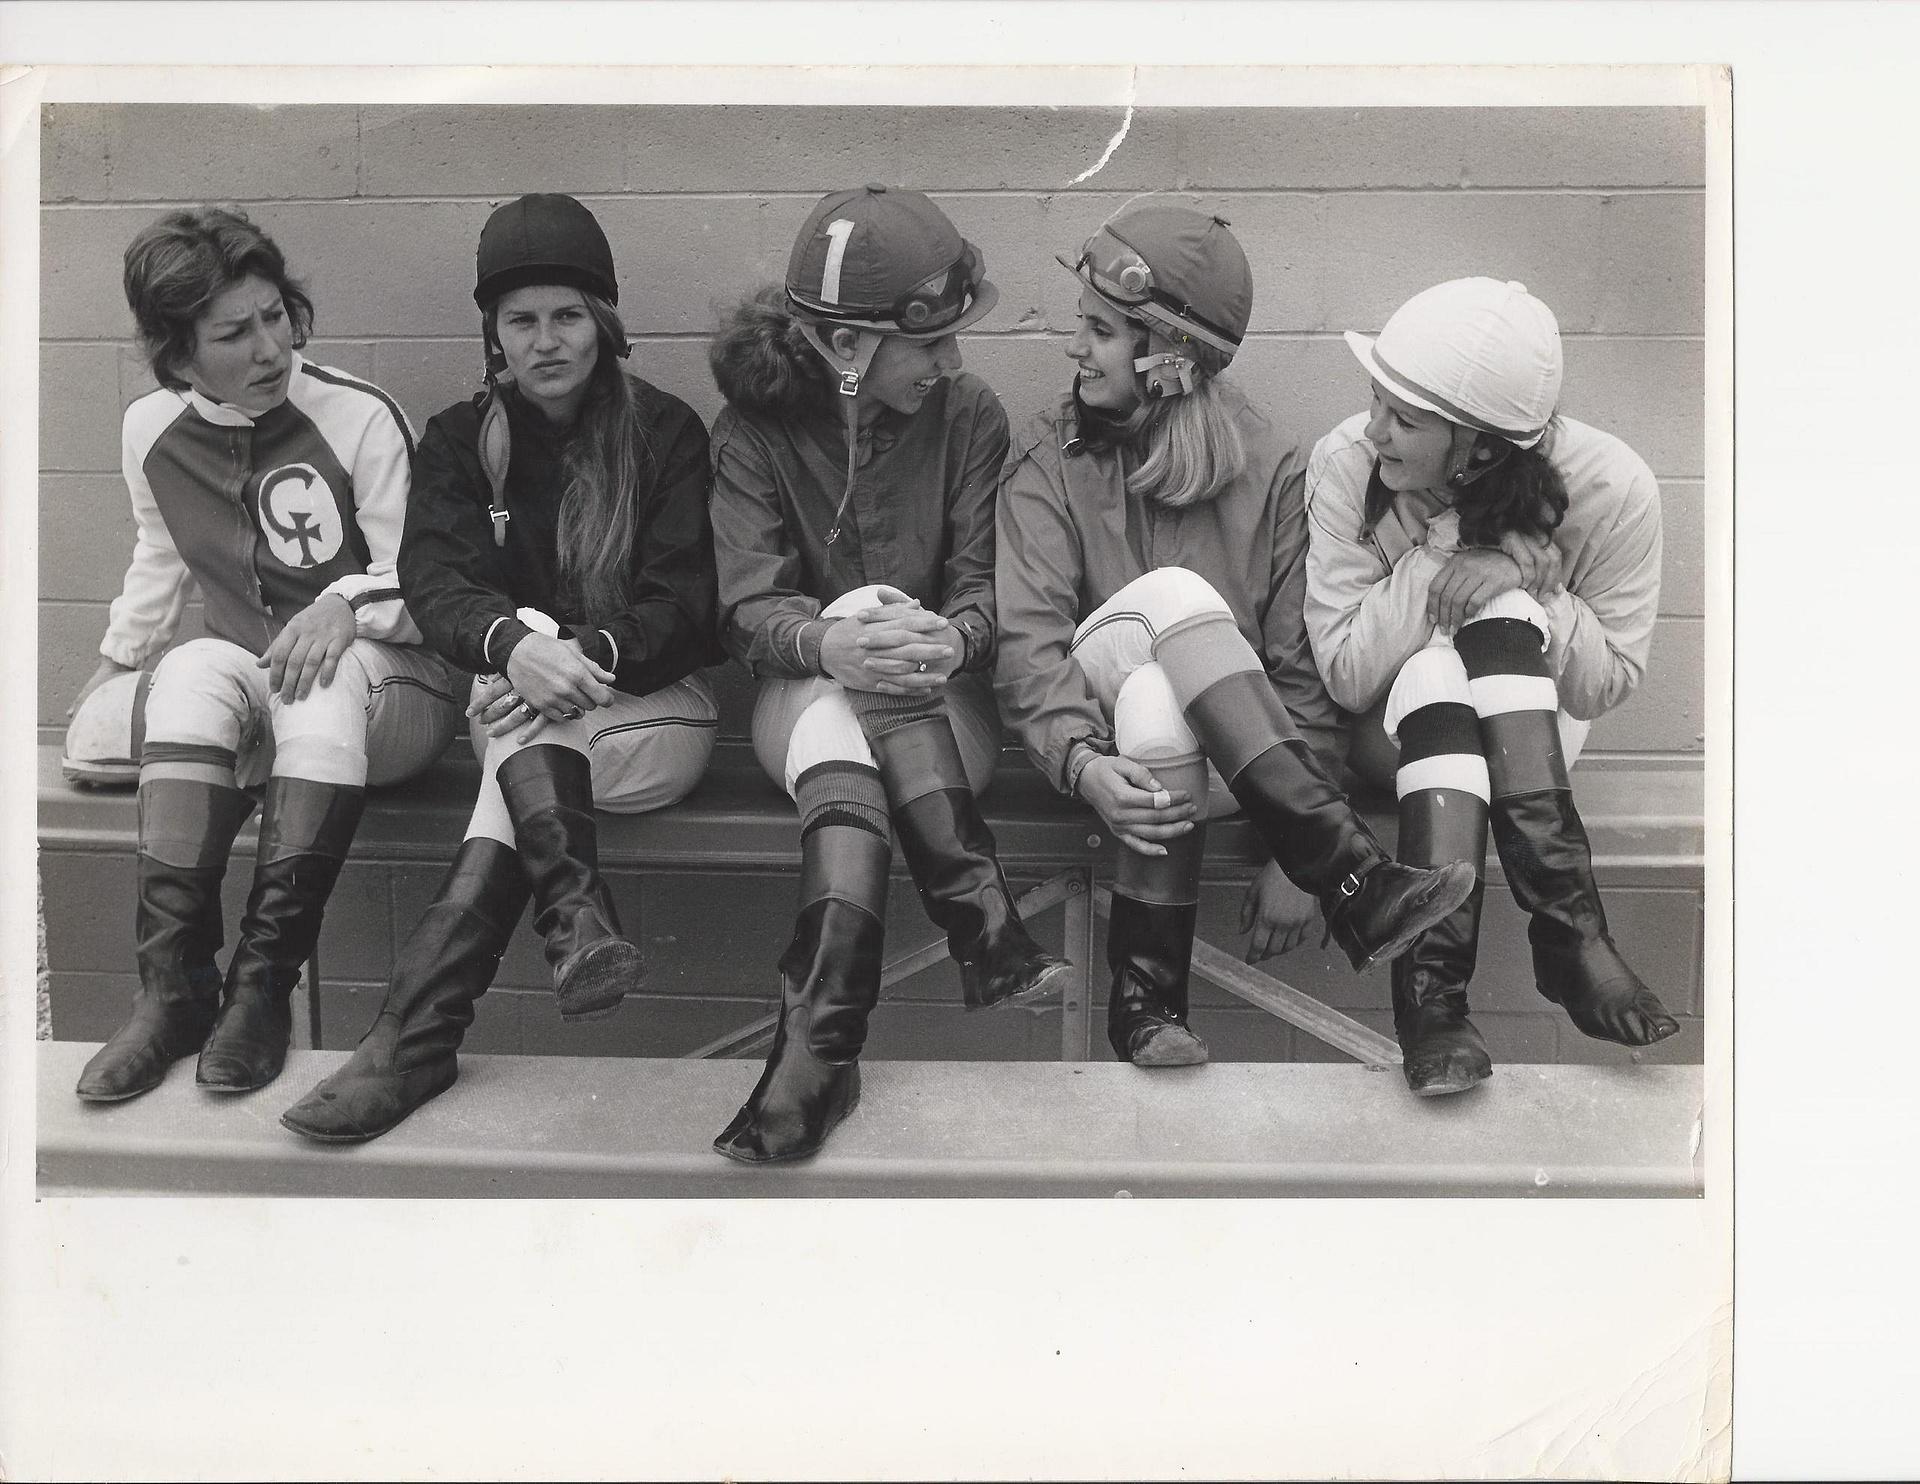 femalejockeys's Gallery